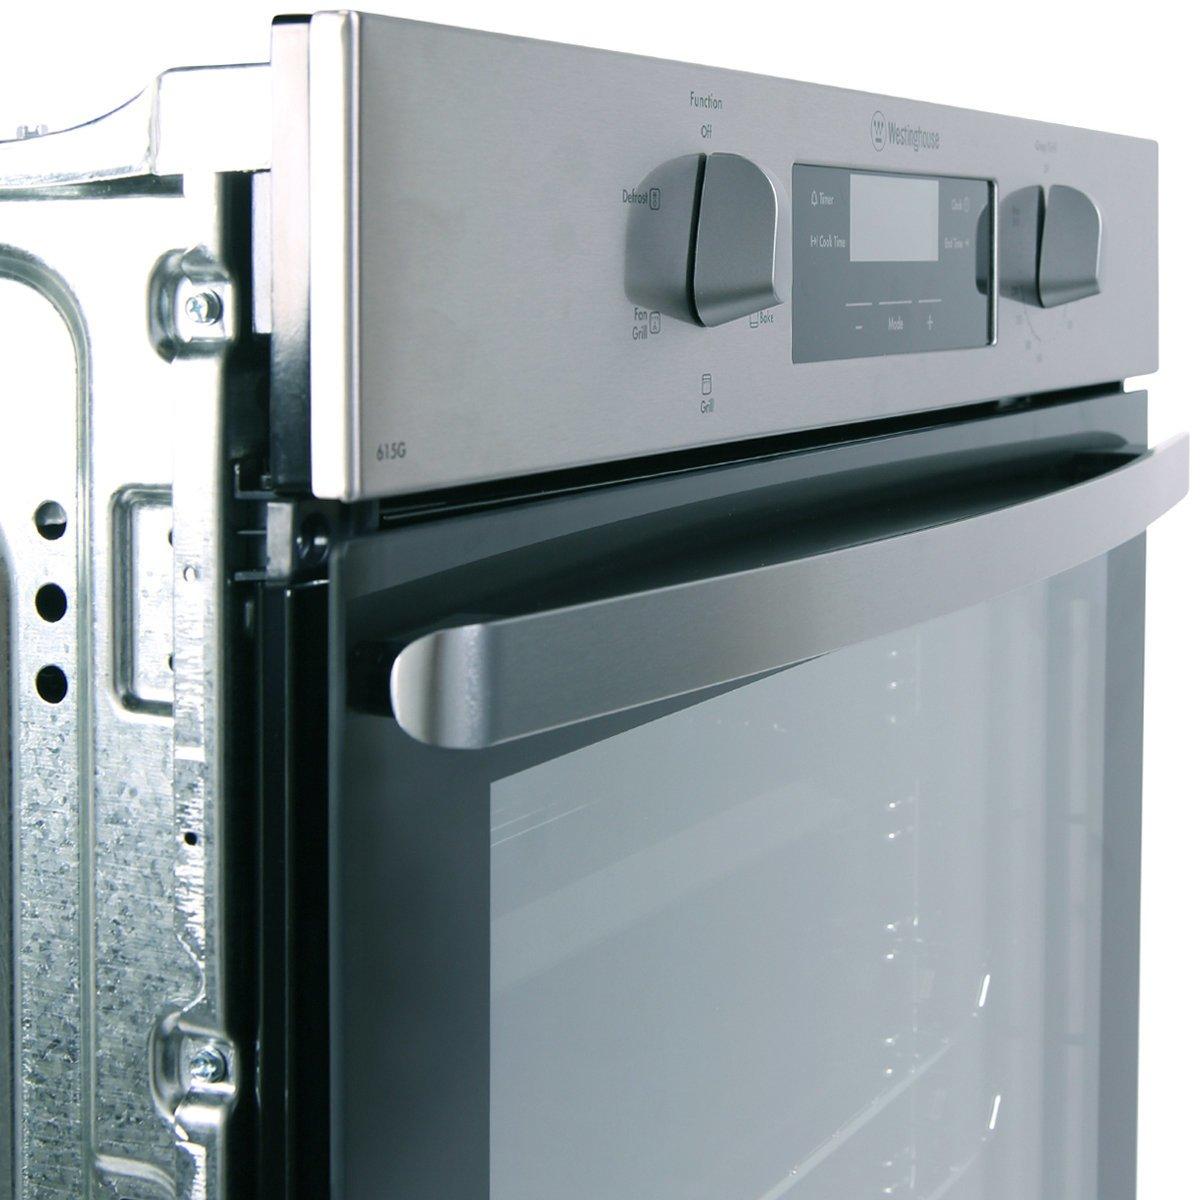 Westinghouse WVG615SLPG 60cm LPG Gas Built-In Oven | Appliances Online